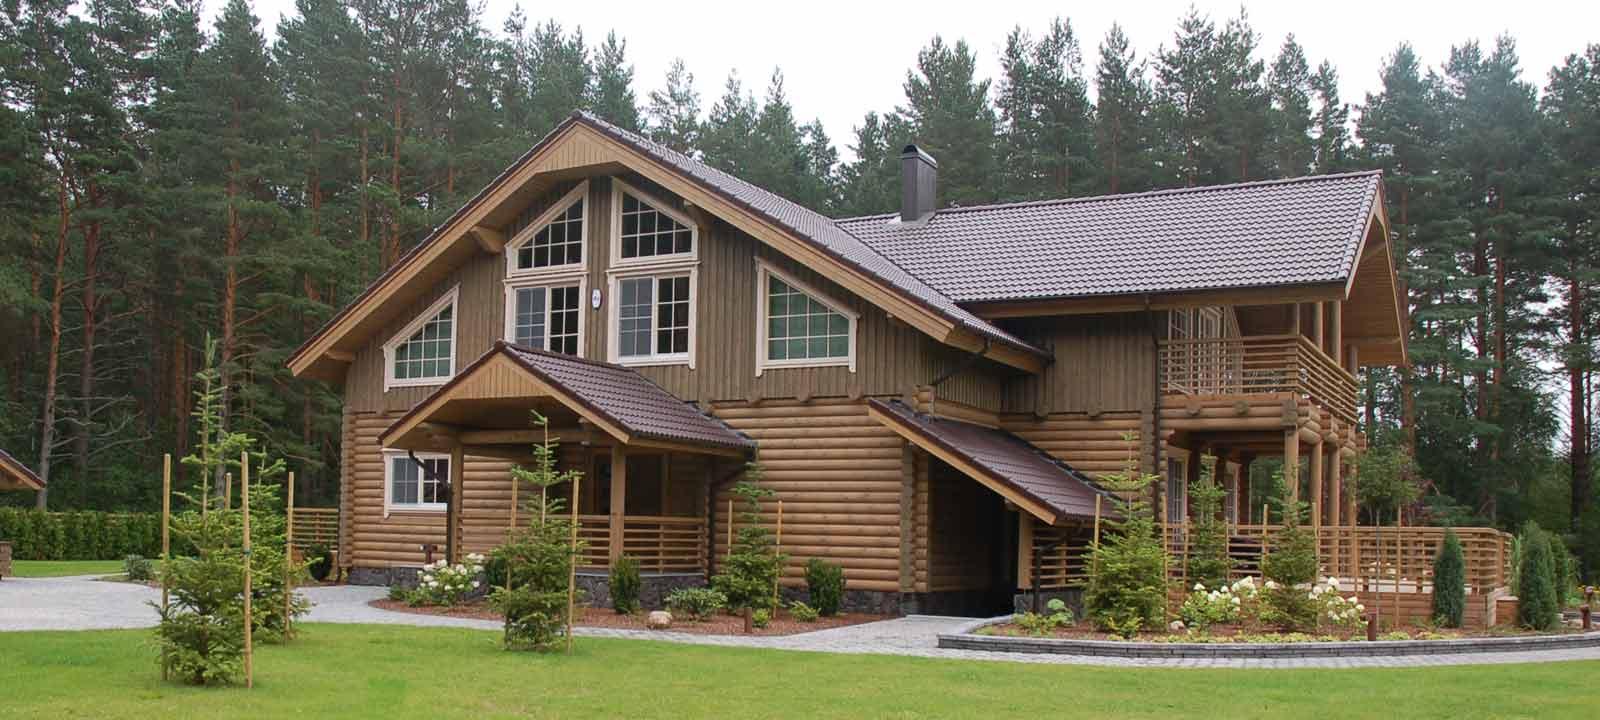 WoodVille Design Blokhut KINGSLANDING RLR 650M2 Huis